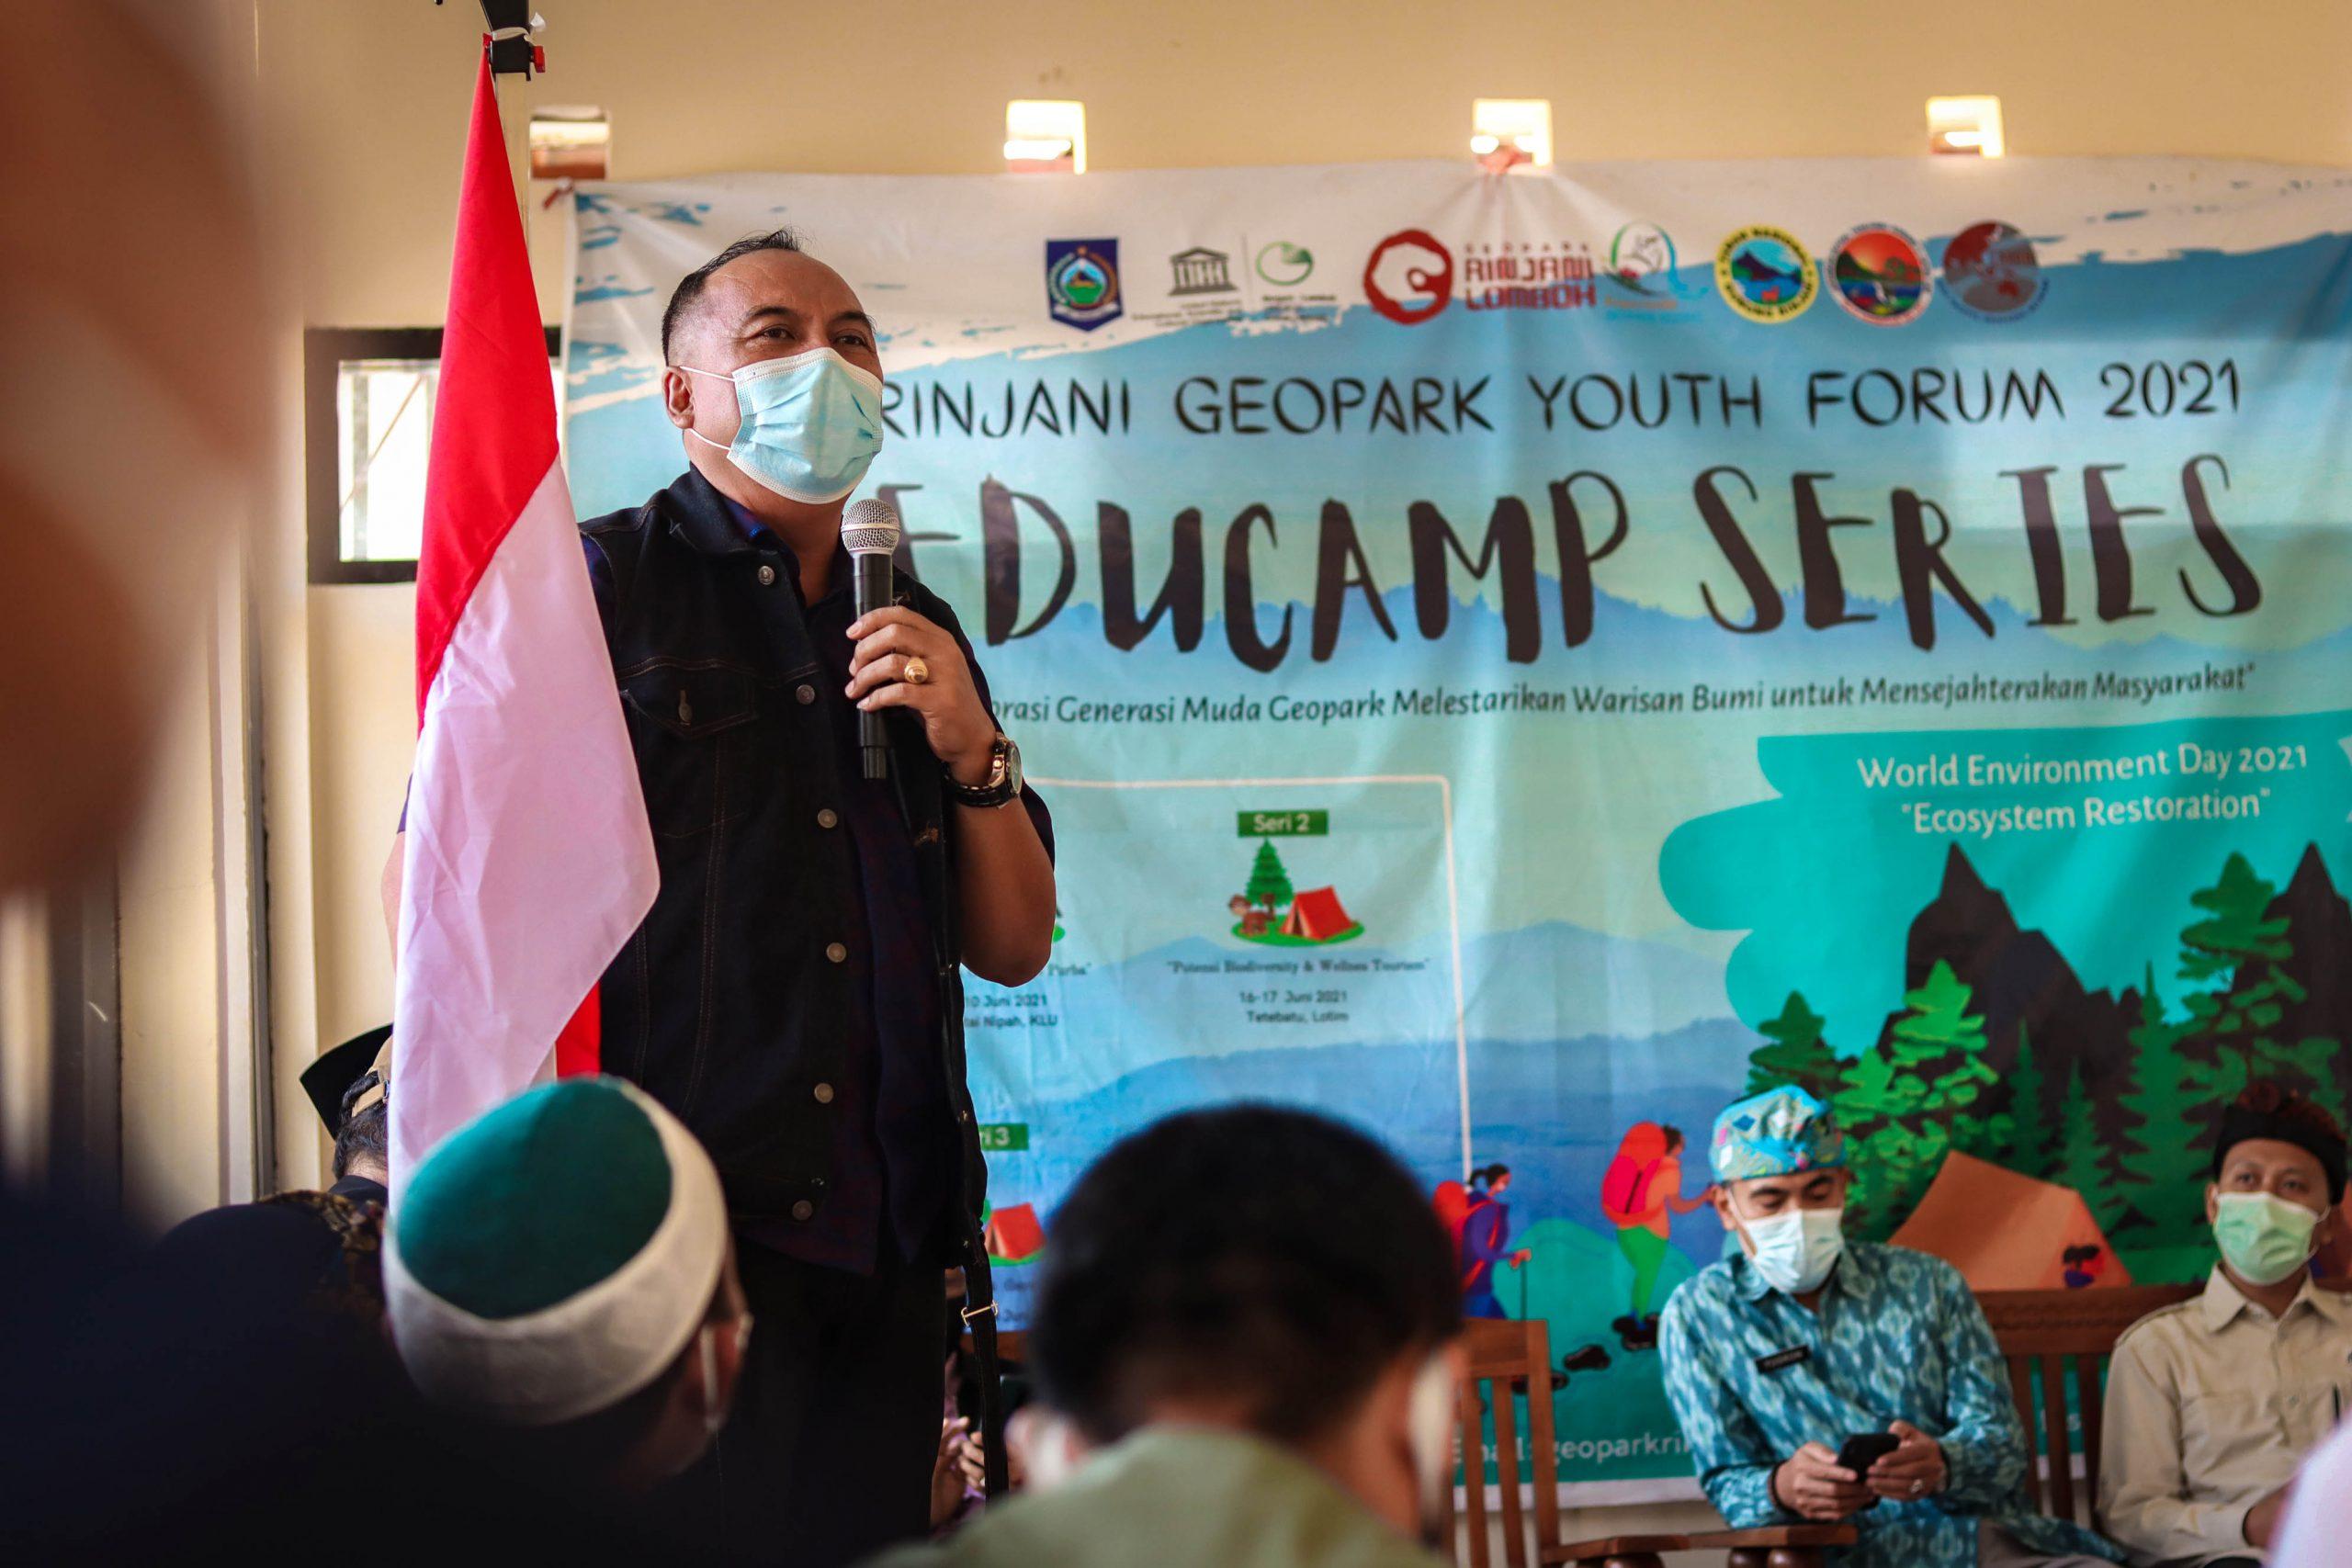 Pengembangan Geopark Rinjani Libatkan Anak-anak Muda